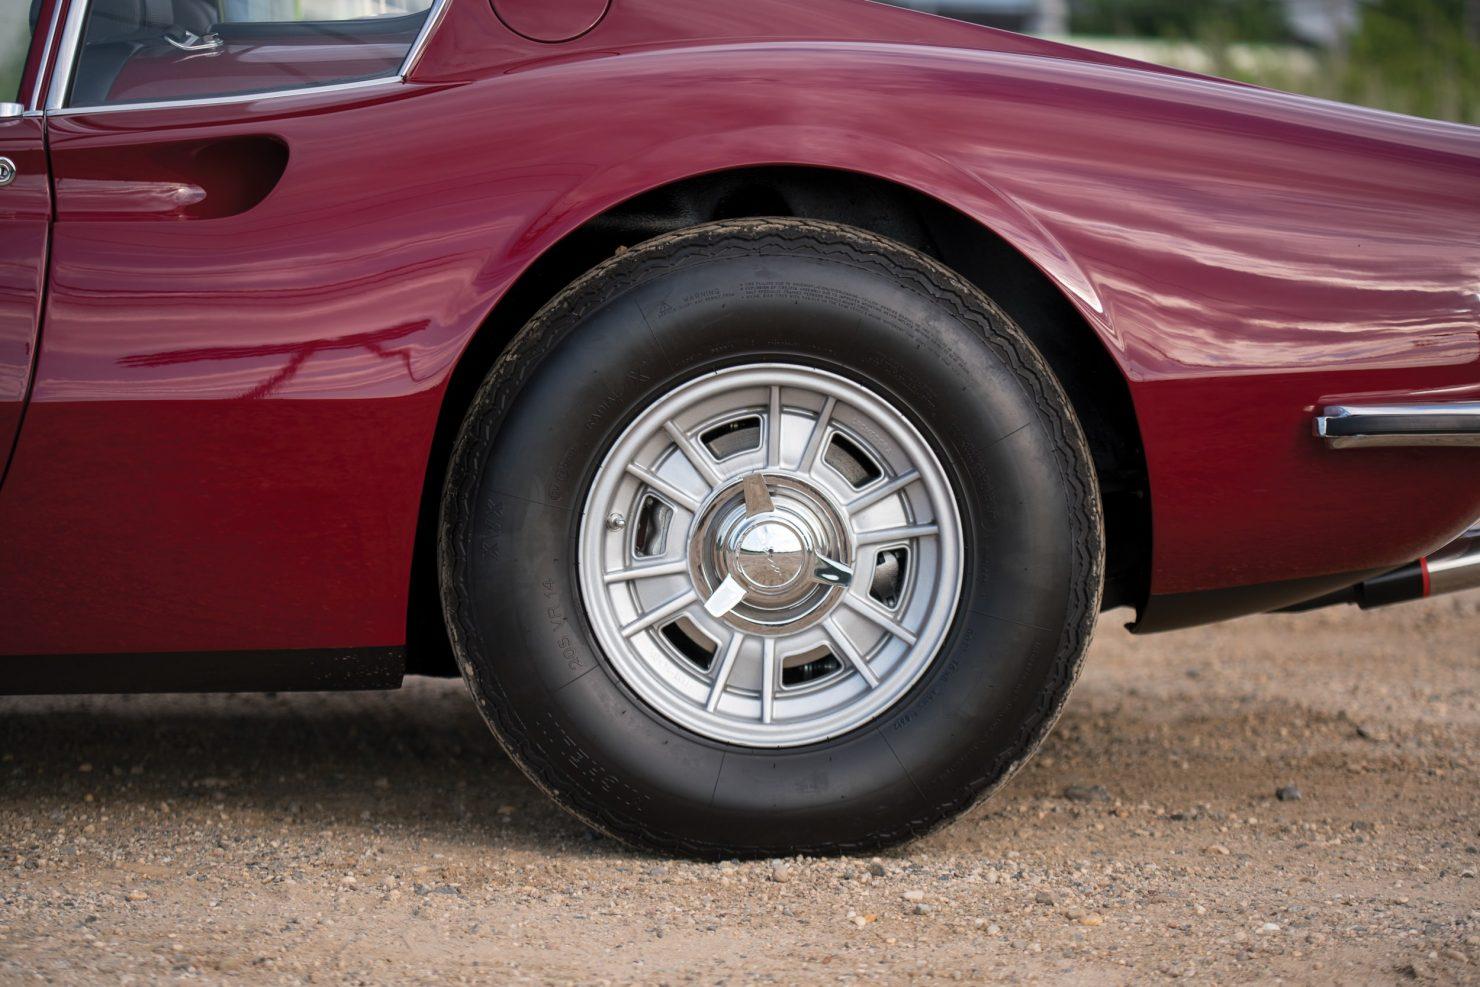 ferrari dino 246 17 1480x987 - 1969 Ferrari Dino 246 GT